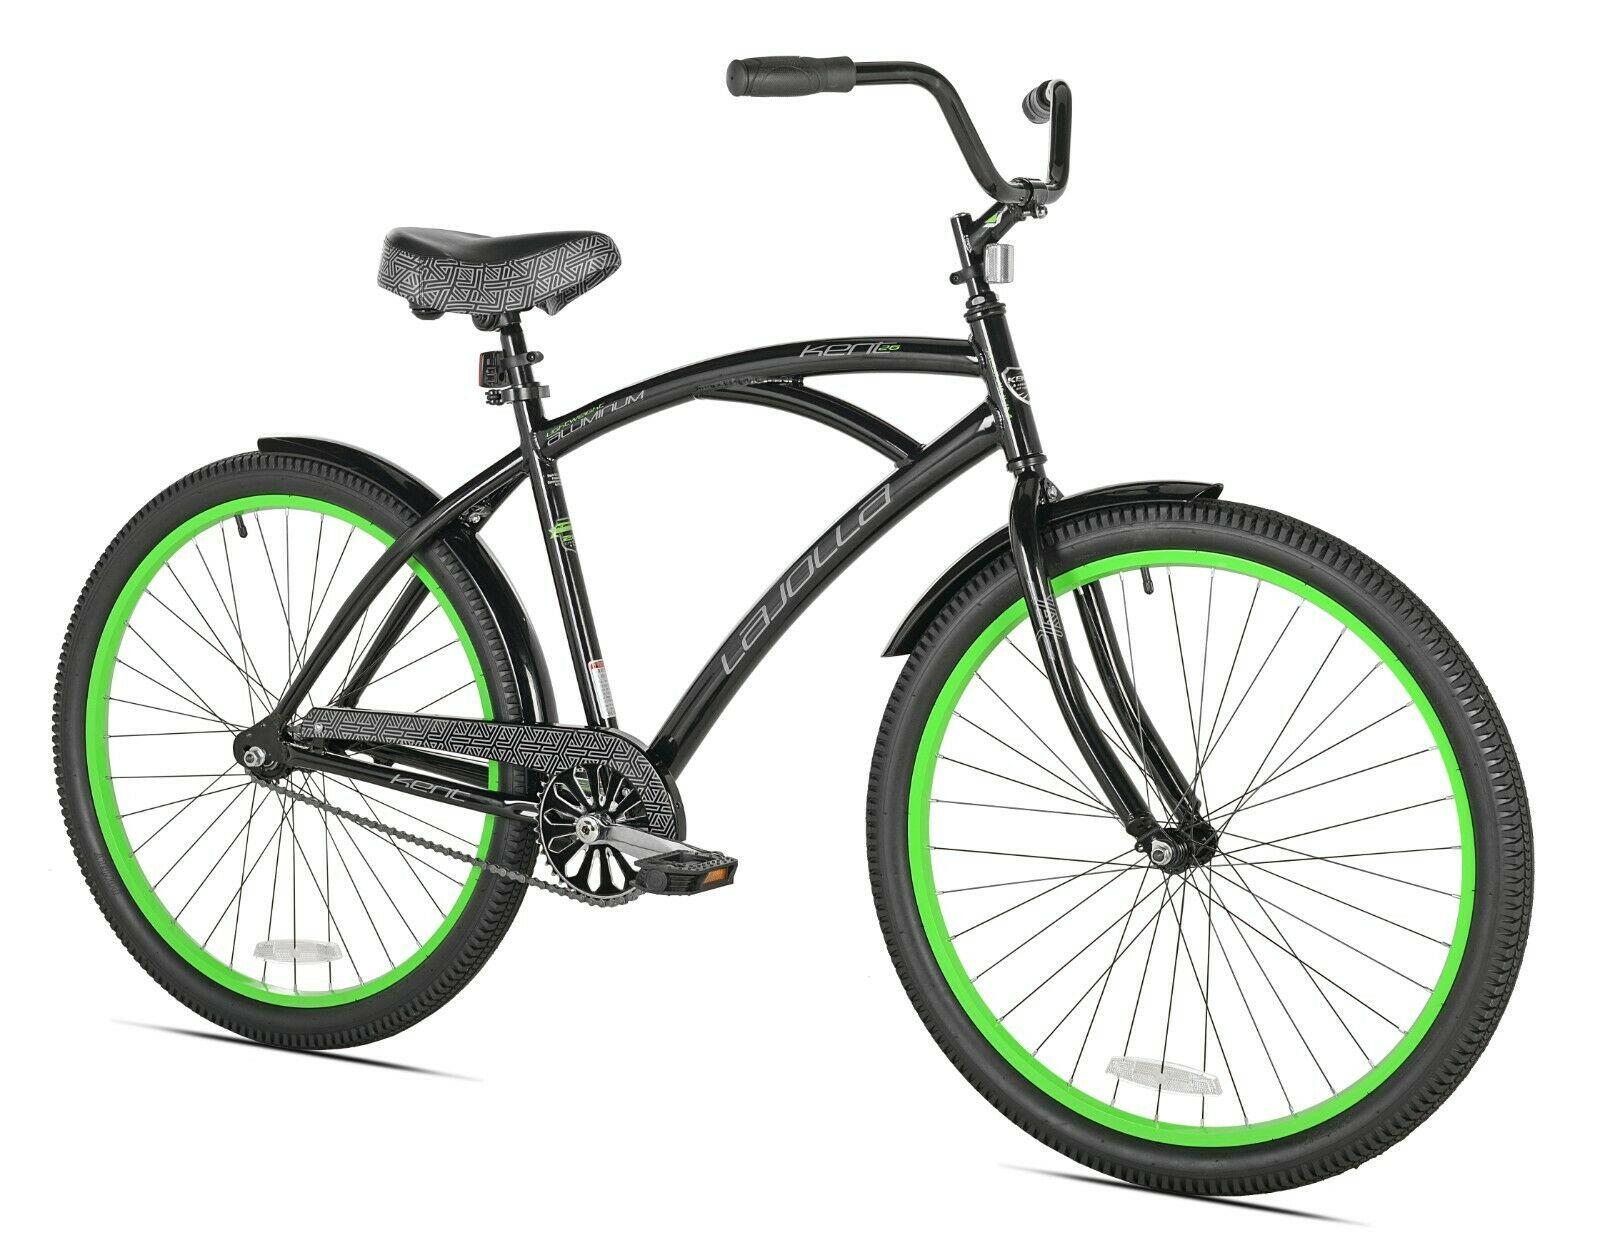 "Kent 26"" La Jolla Cruiser Men's Bike, Black/Green Free fast shipping new - $332.50"